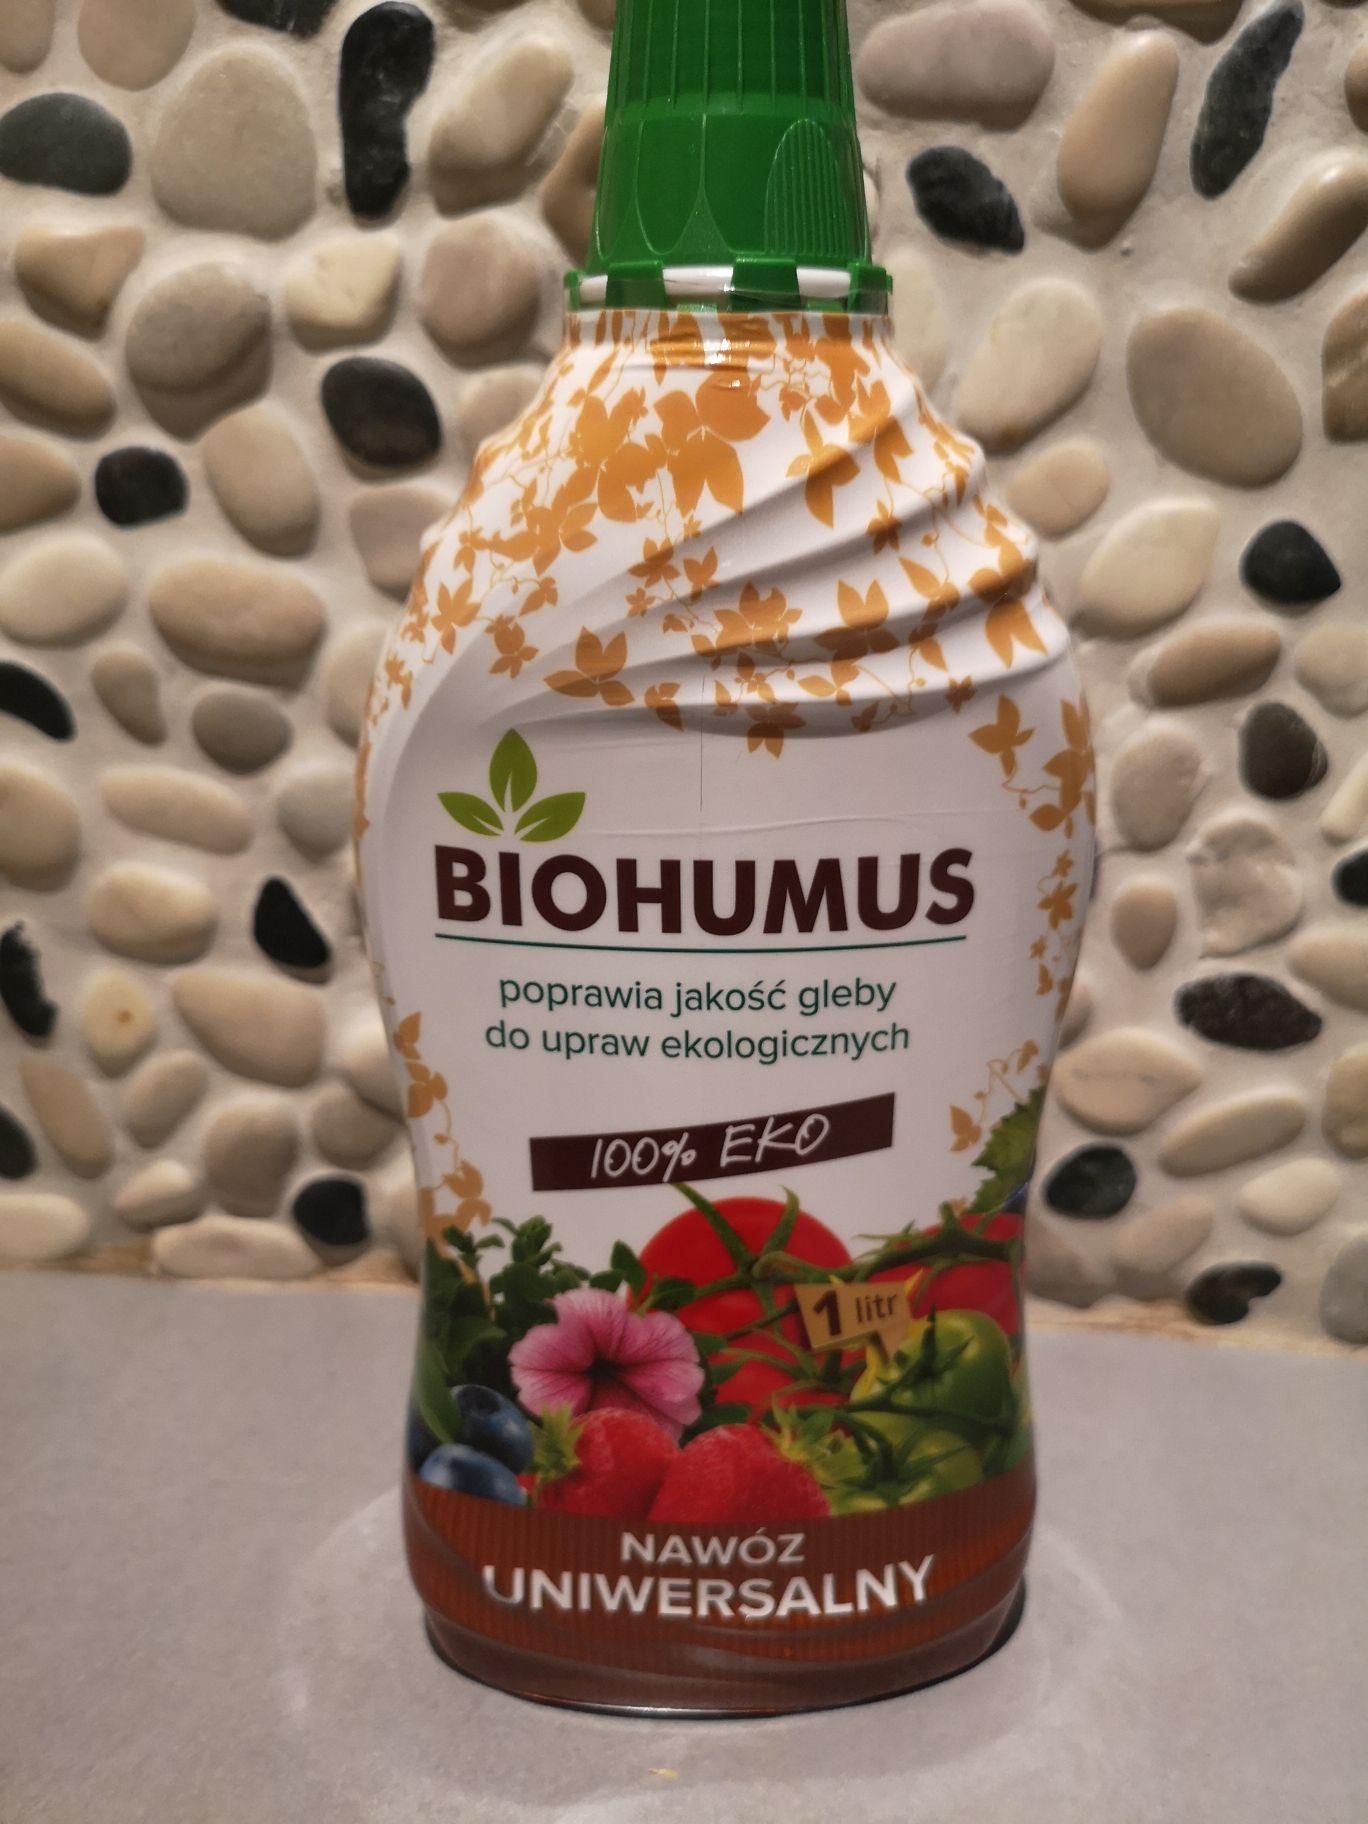 Rossmann: Biohummus - nawóz do roślin